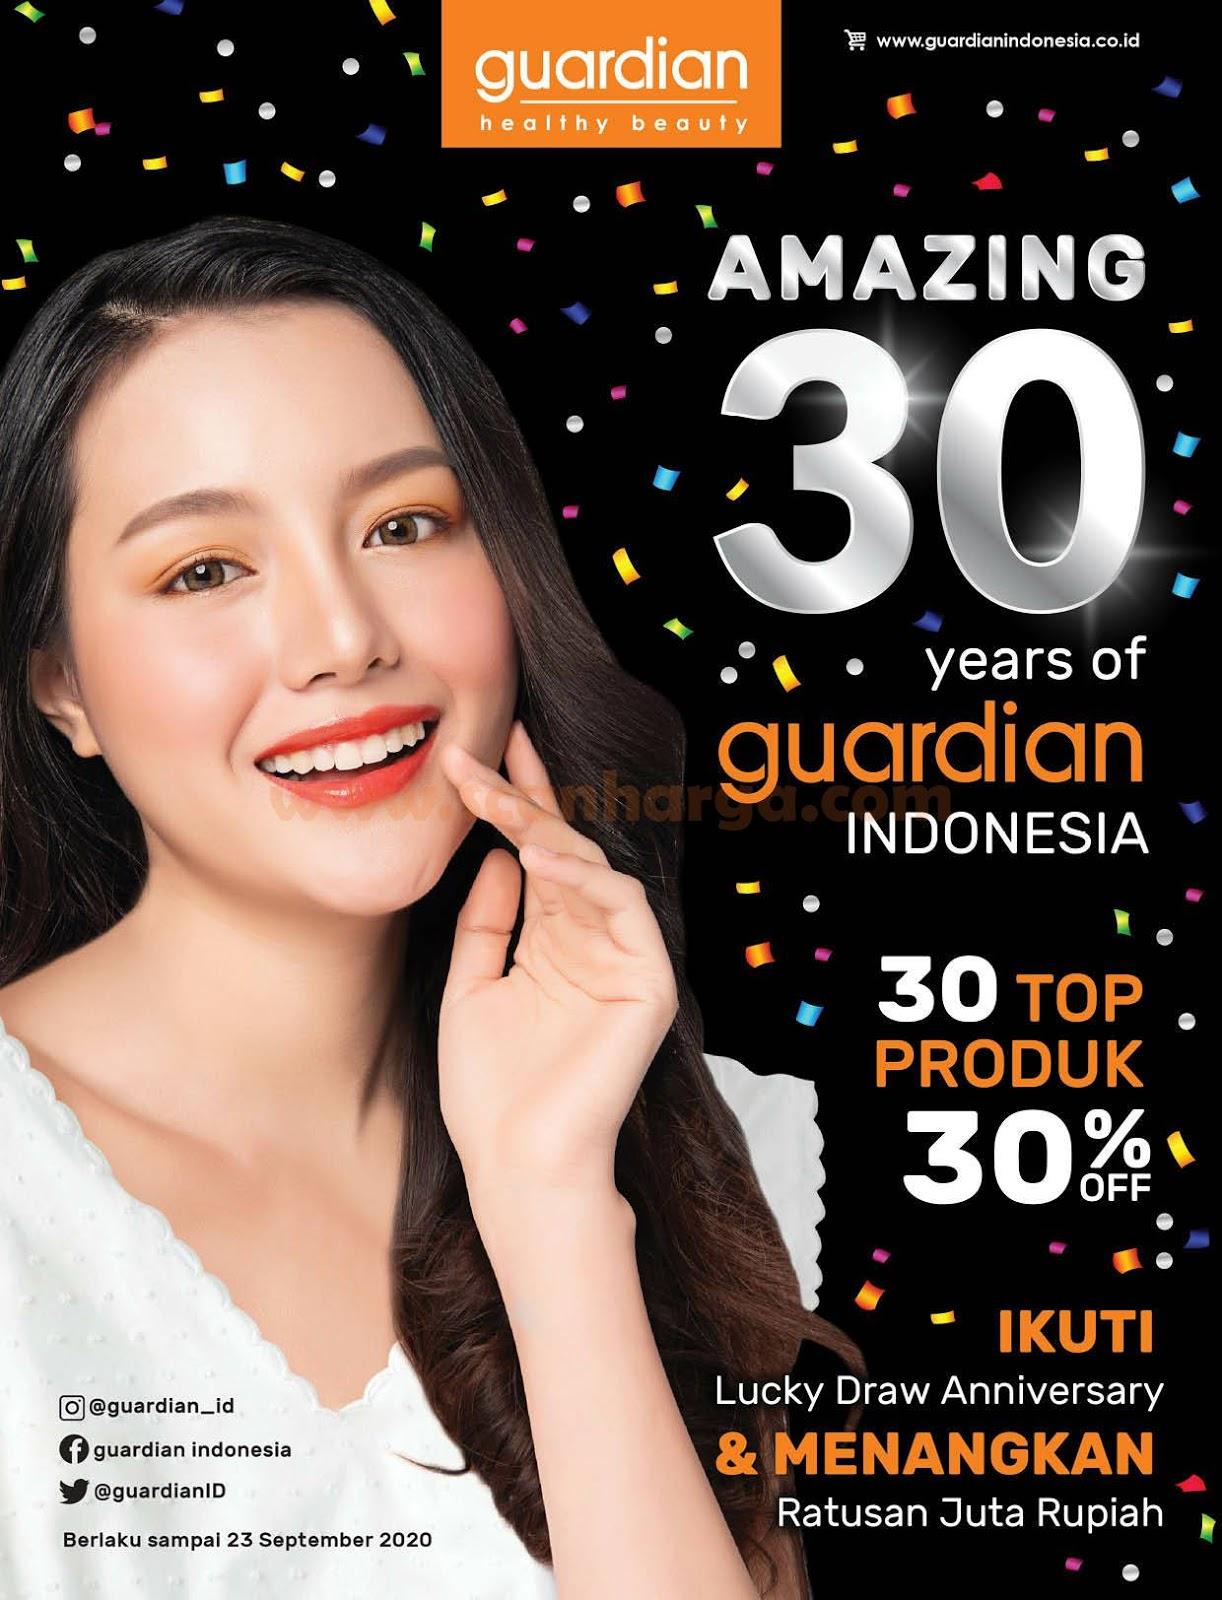 Katalog Guardian Promo Terbaru September 2020